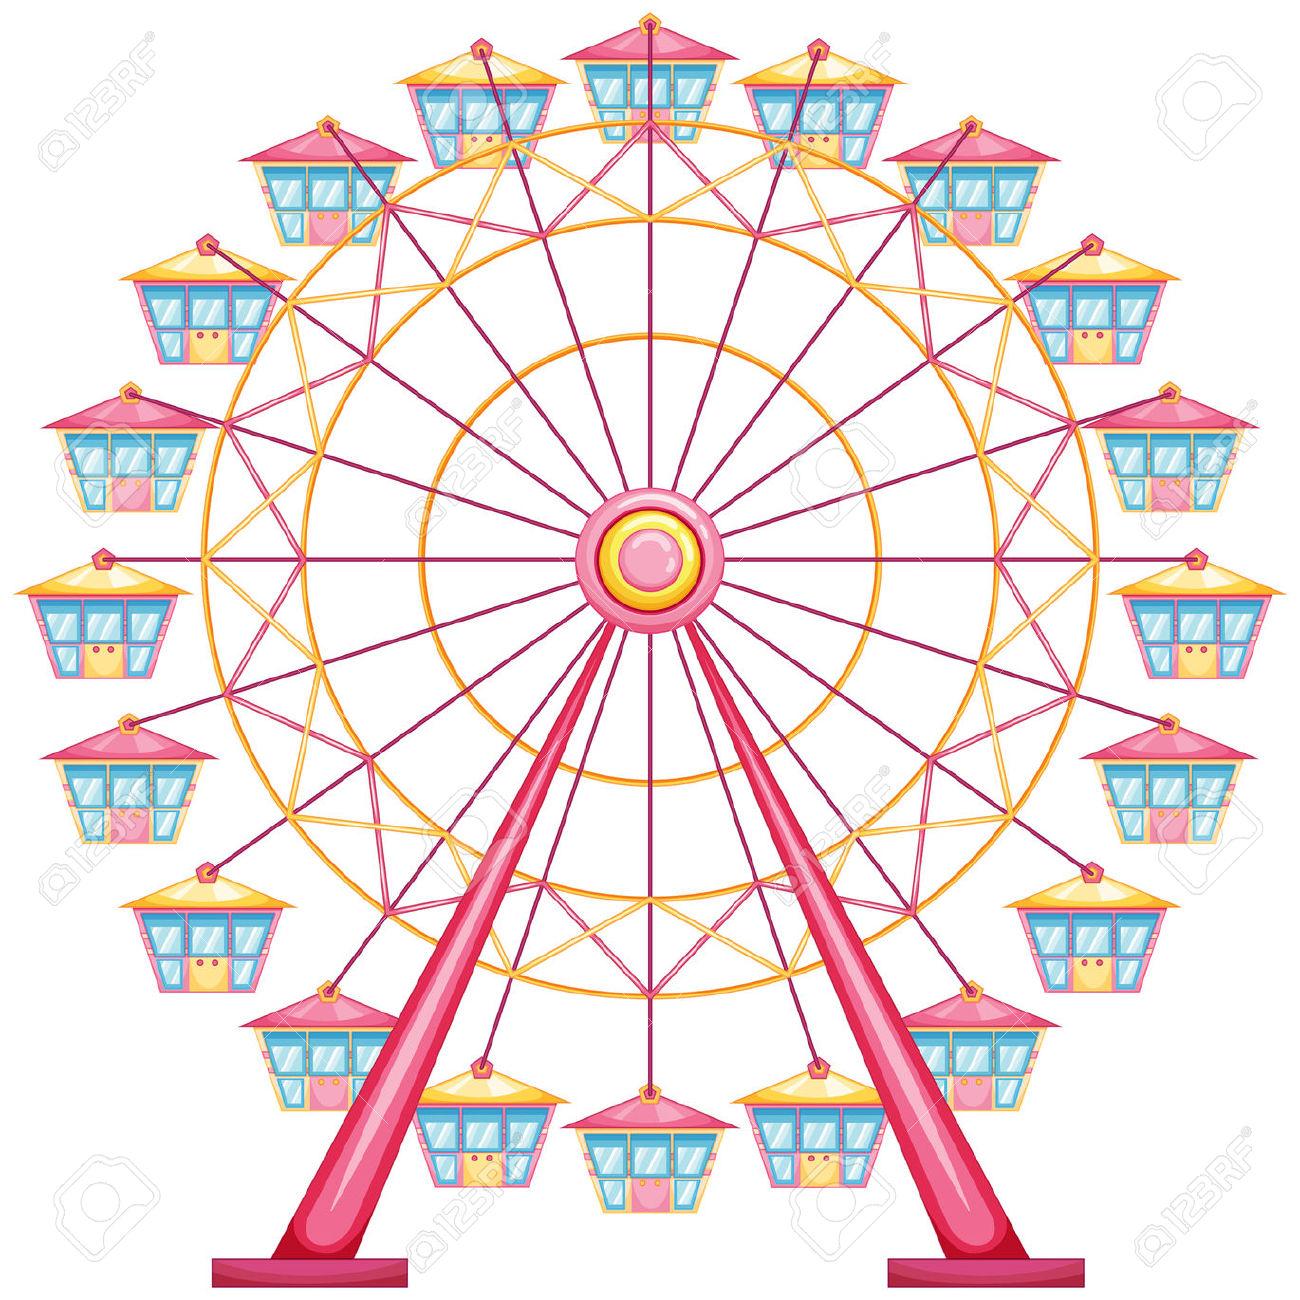 Ferris wheel clipart 2-Ferris wheel clipart 2-4